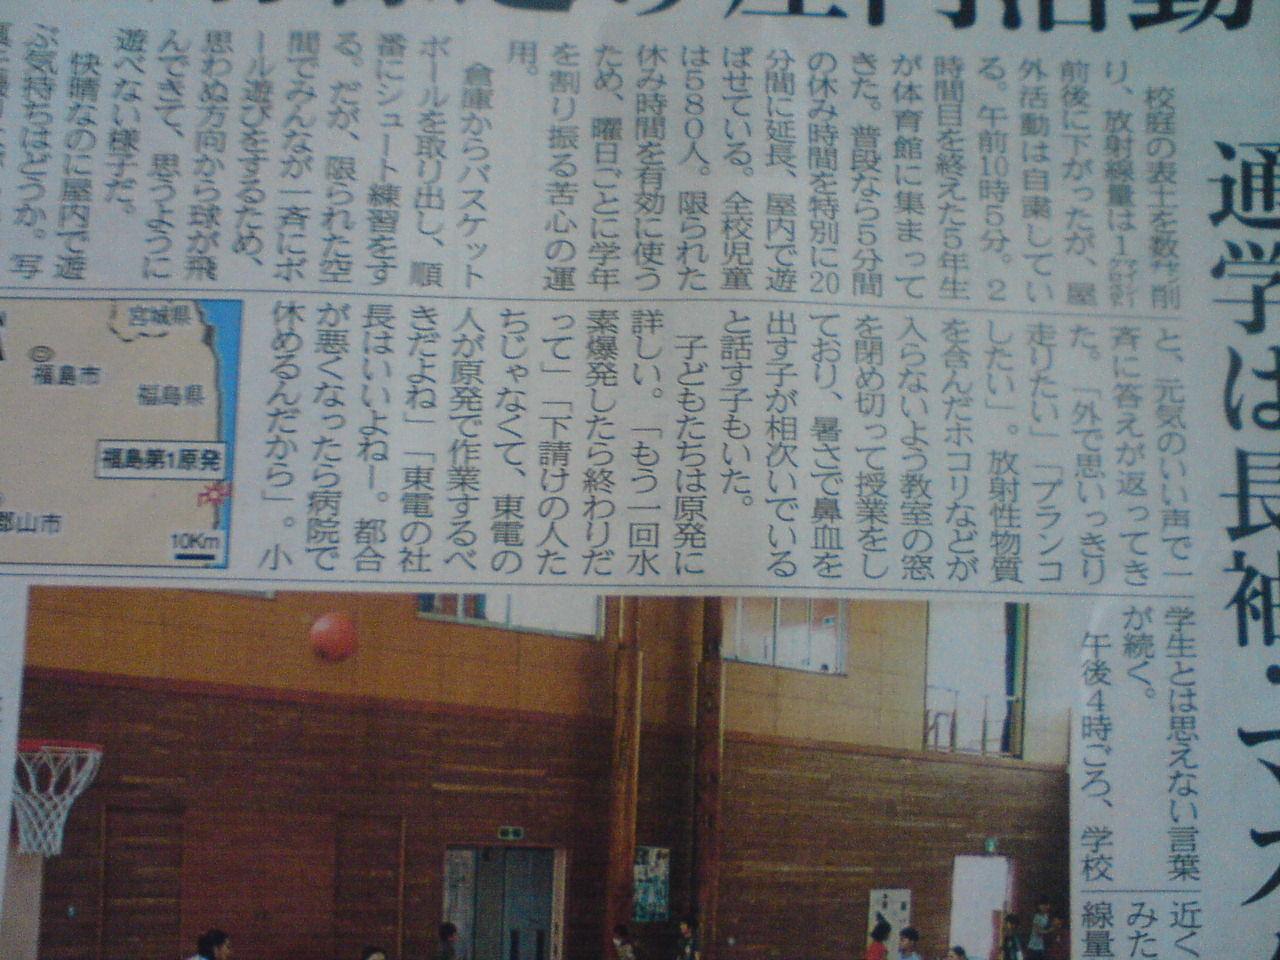 https://livedoor.blogimg.jp/ko_jo/imgs/9/d/9d66b52b.jpg